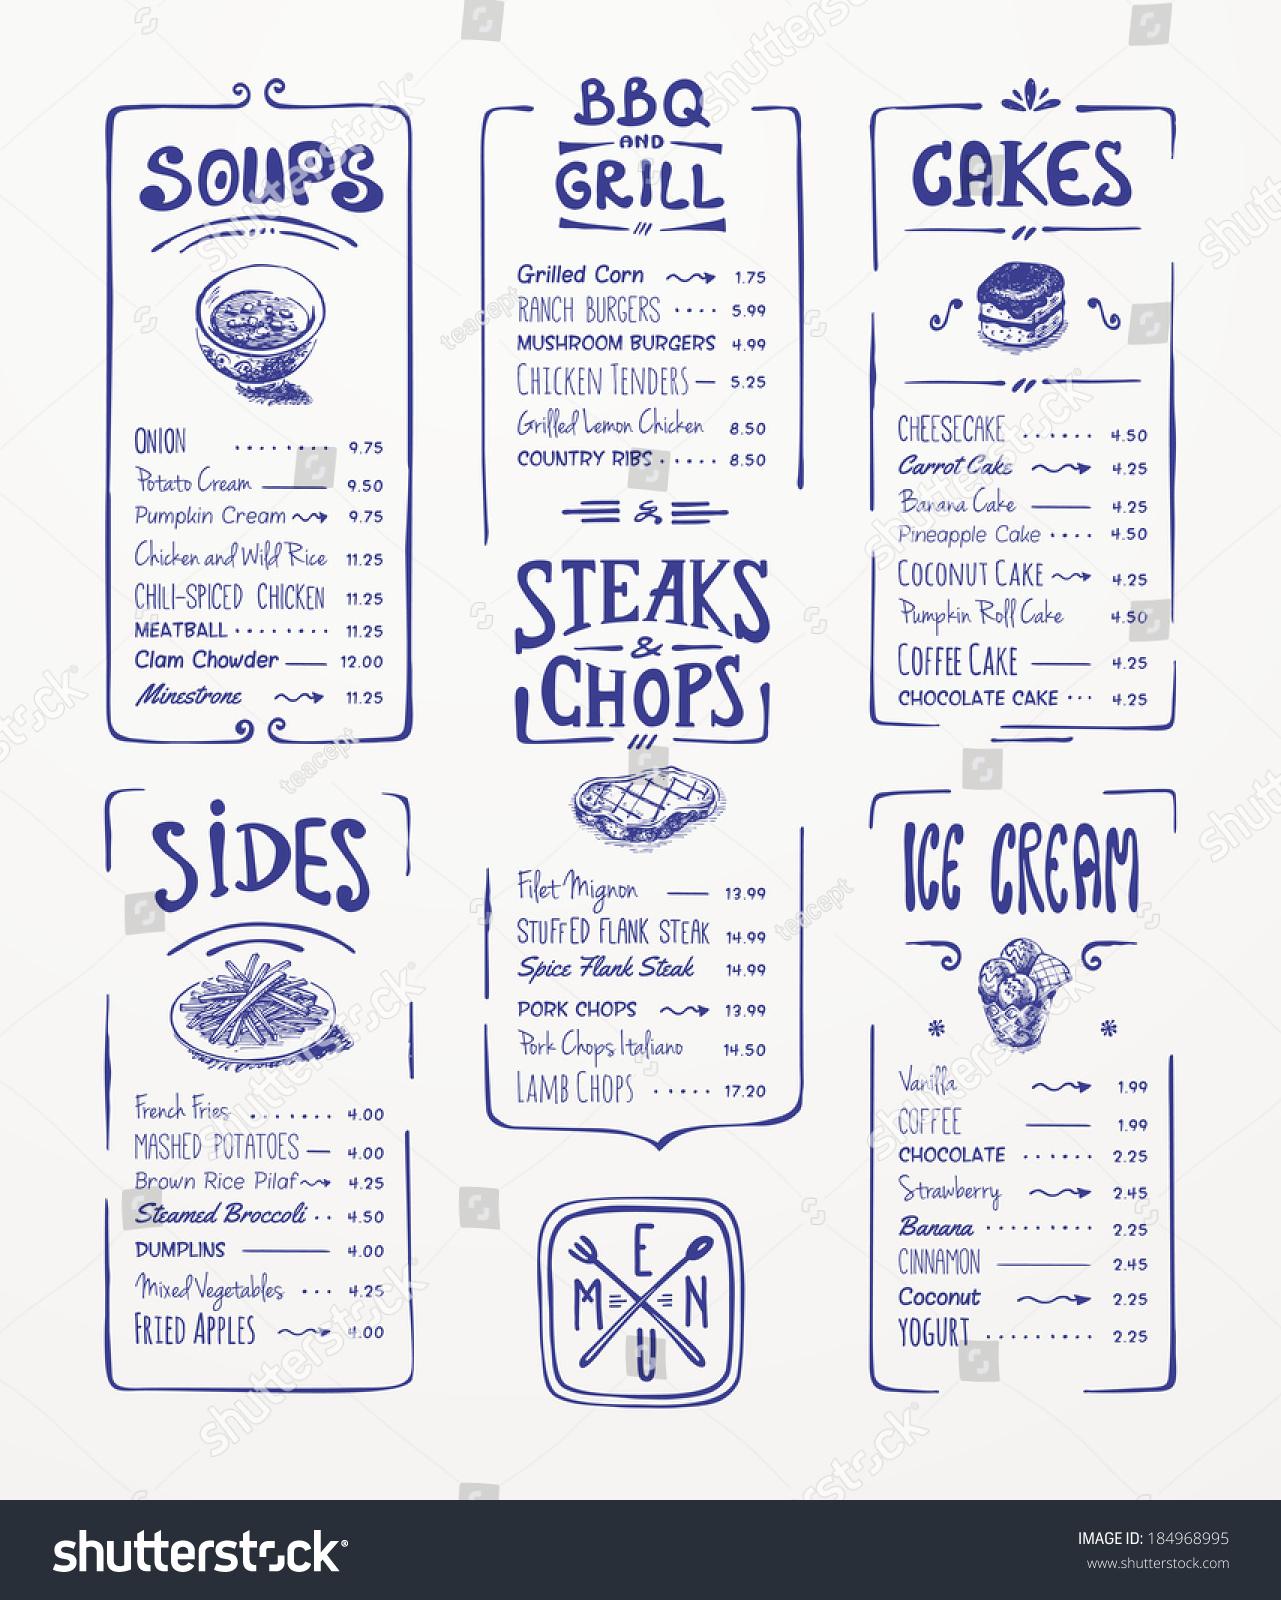 menu template blue pen drawingsoups sides stock vector 184968995 shutterstock. Black Bedroom Furniture Sets. Home Design Ideas